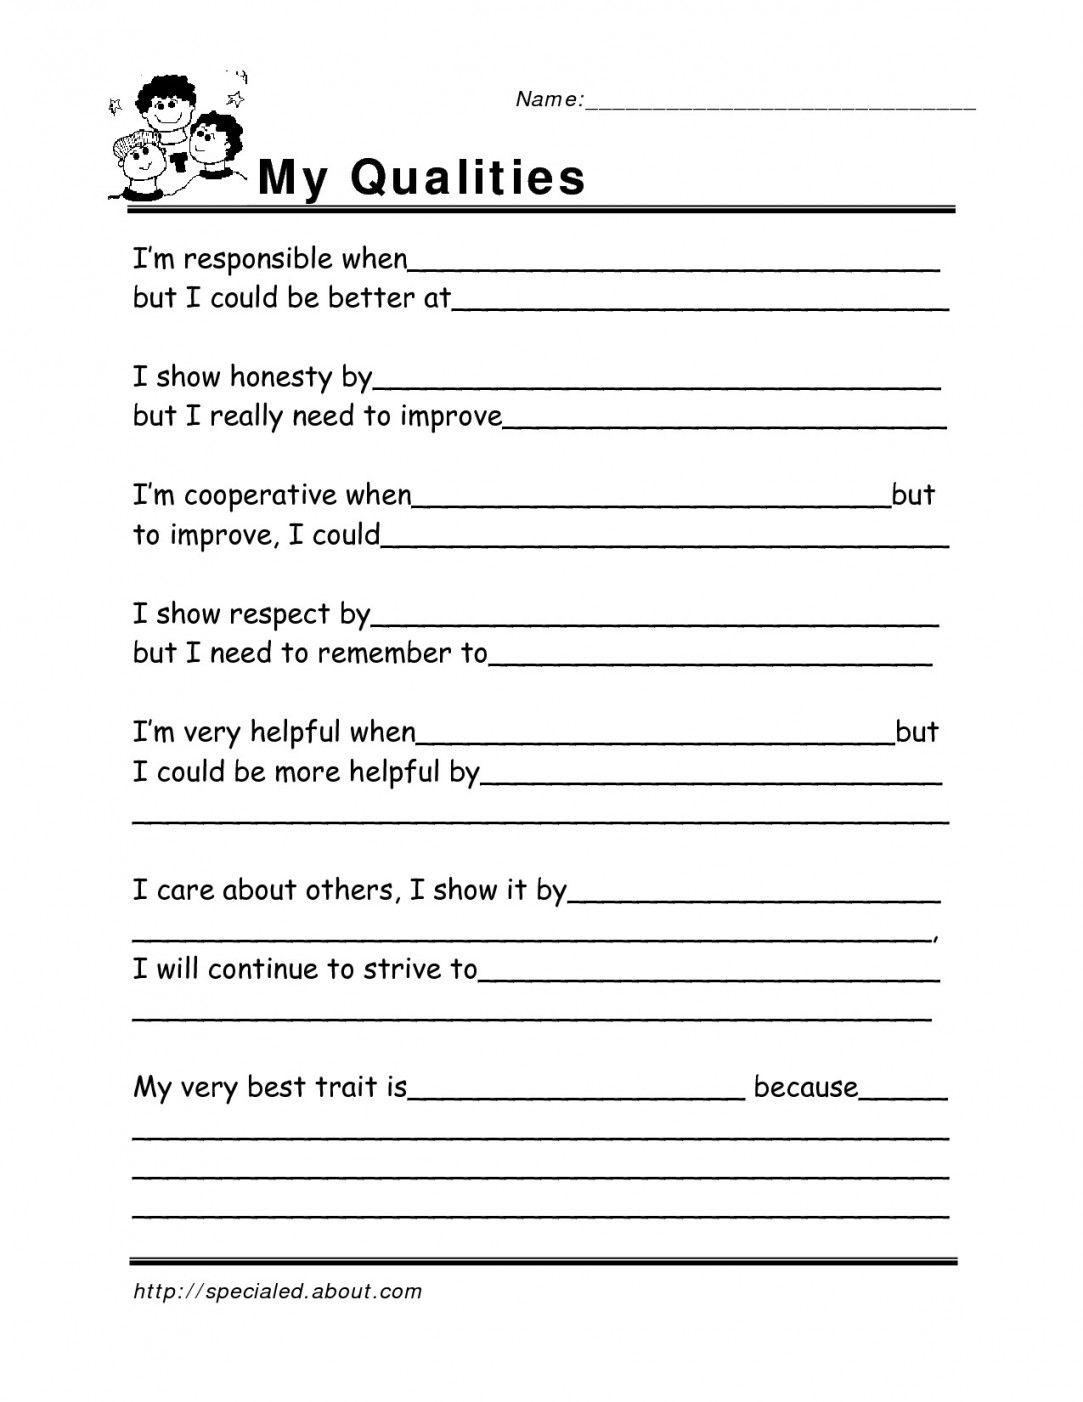 Free Printable Coping Skills Worksheets | Lostranquillos - Free - Free Printable Coping Skills Worksheets